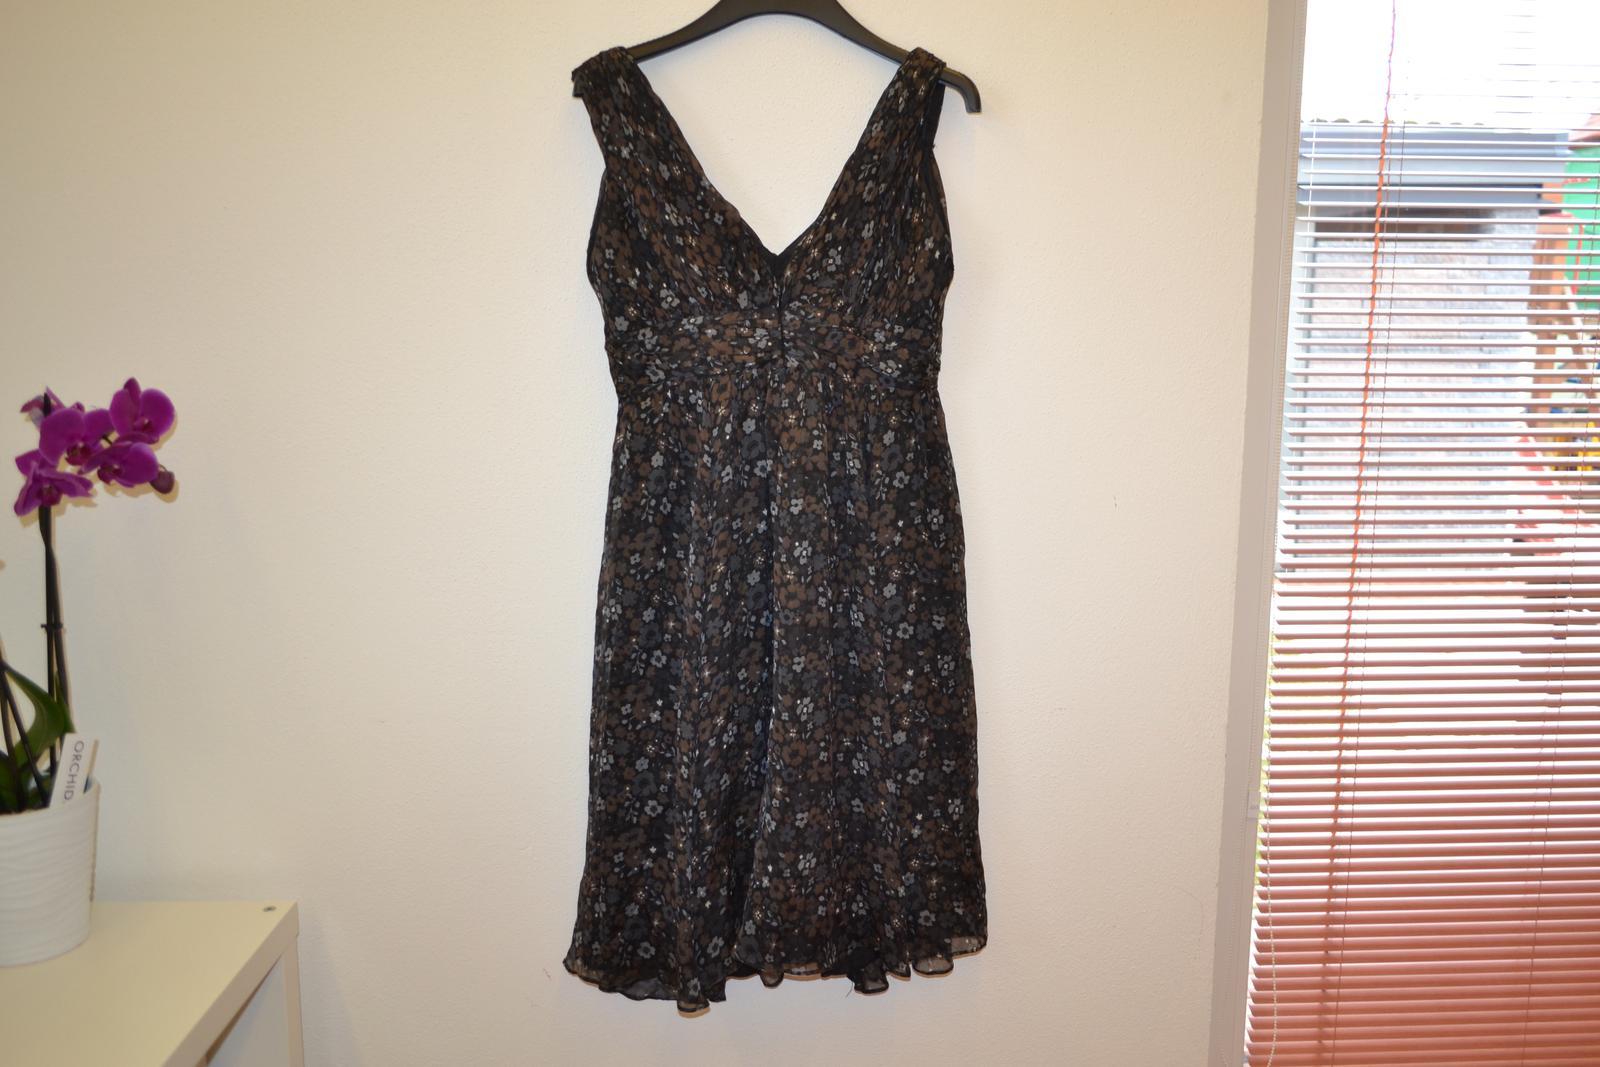 Hedvábné šaty zn. Zara top stav - Obrázek č. 3